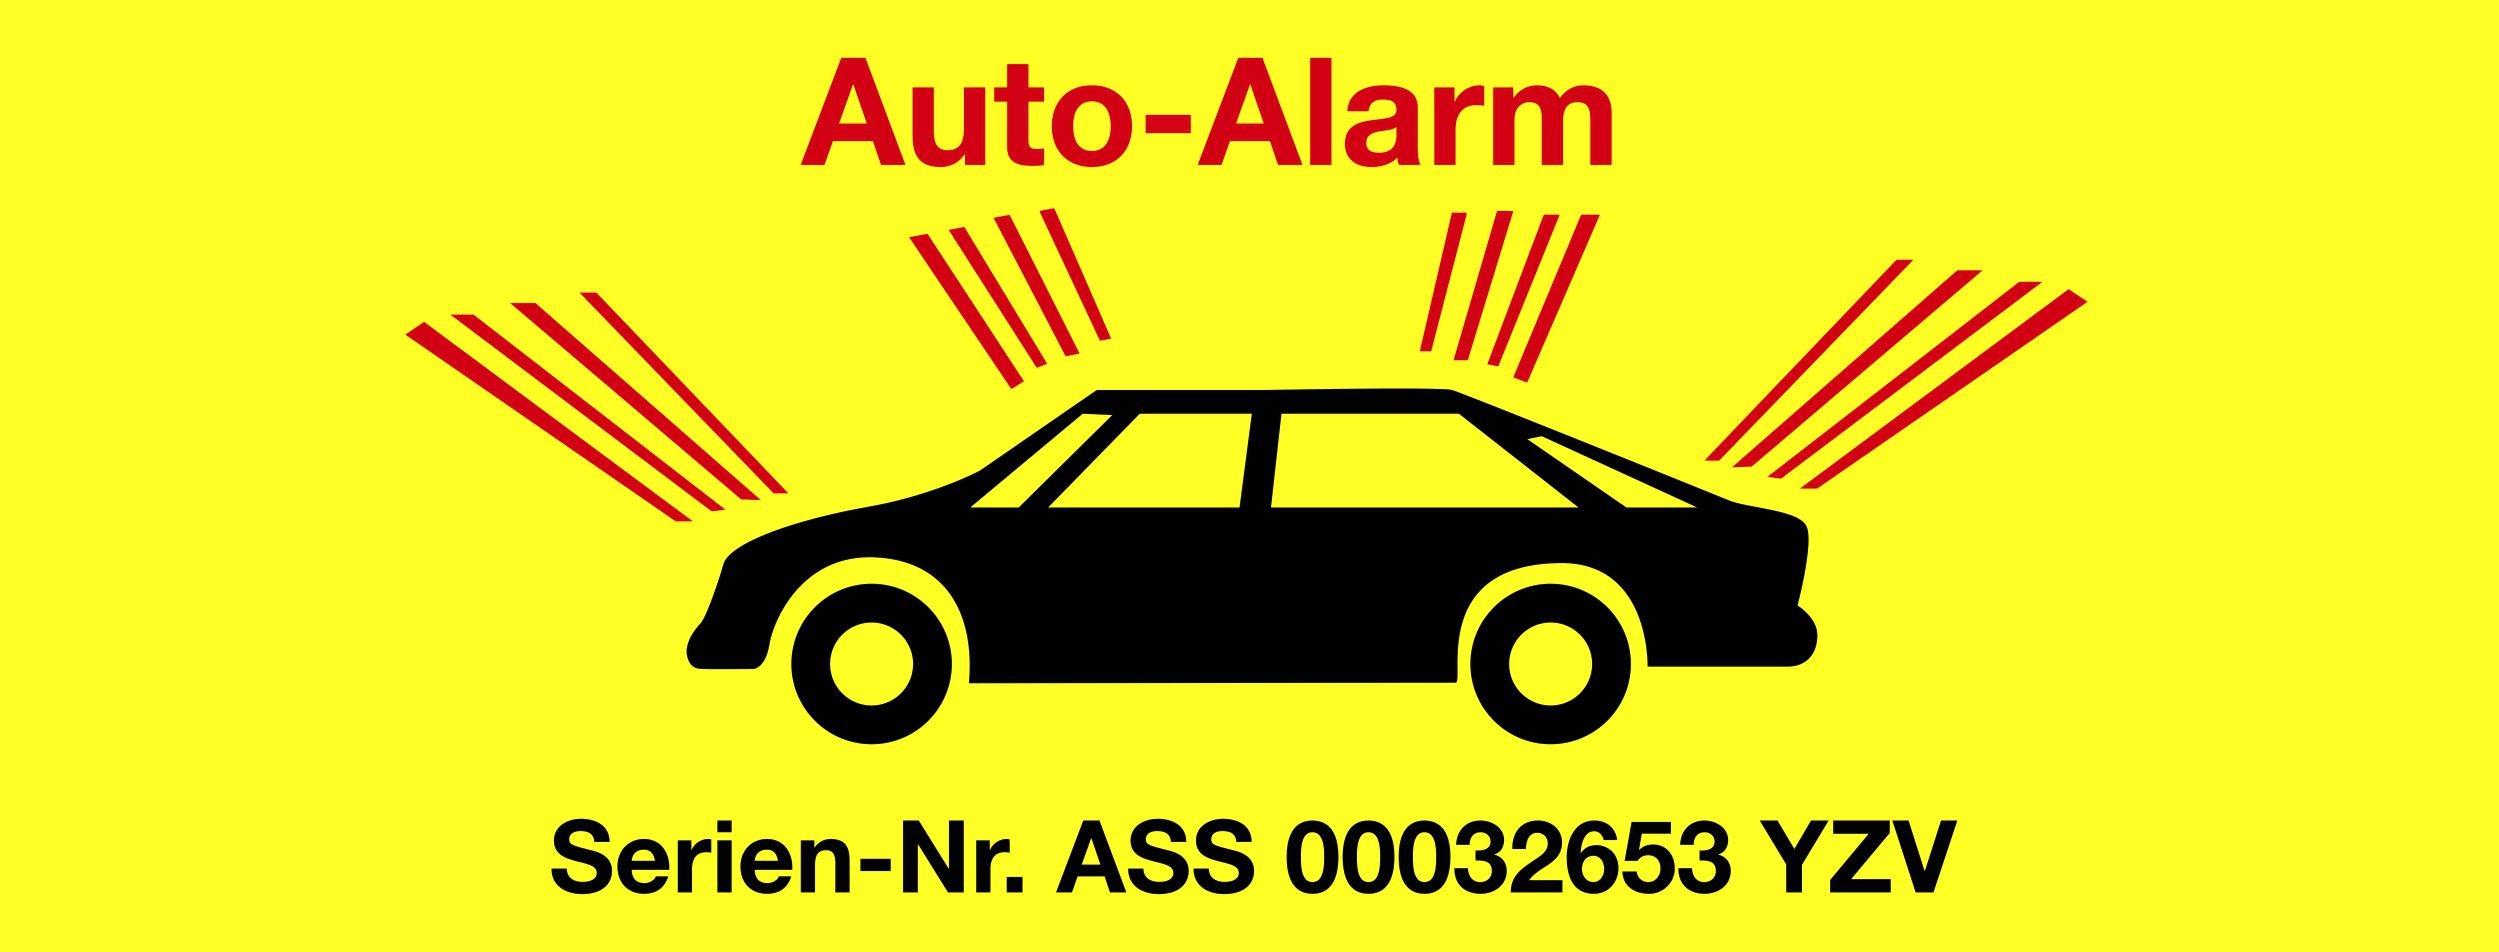 Sticker Auto-Alarm